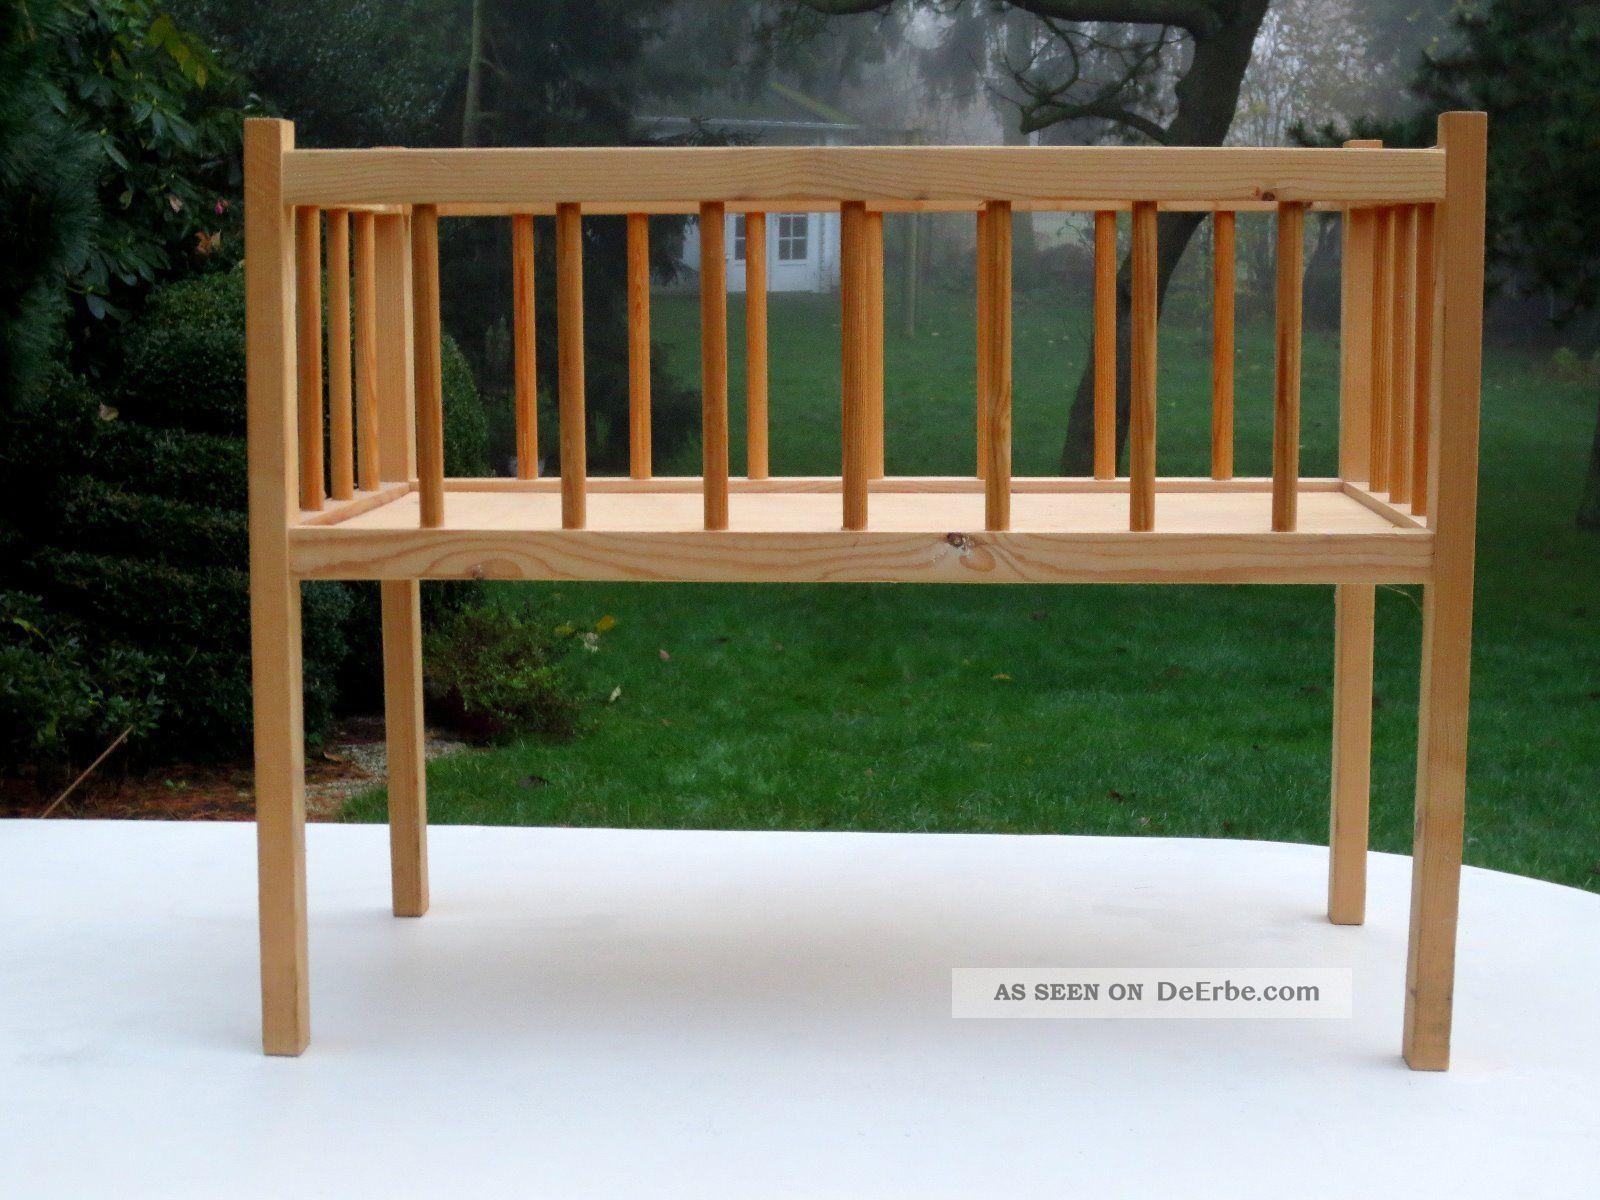 stabiles grosses puppenbett holz 64 x 33 x 50cm. Black Bedroom Furniture Sets. Home Design Ideas